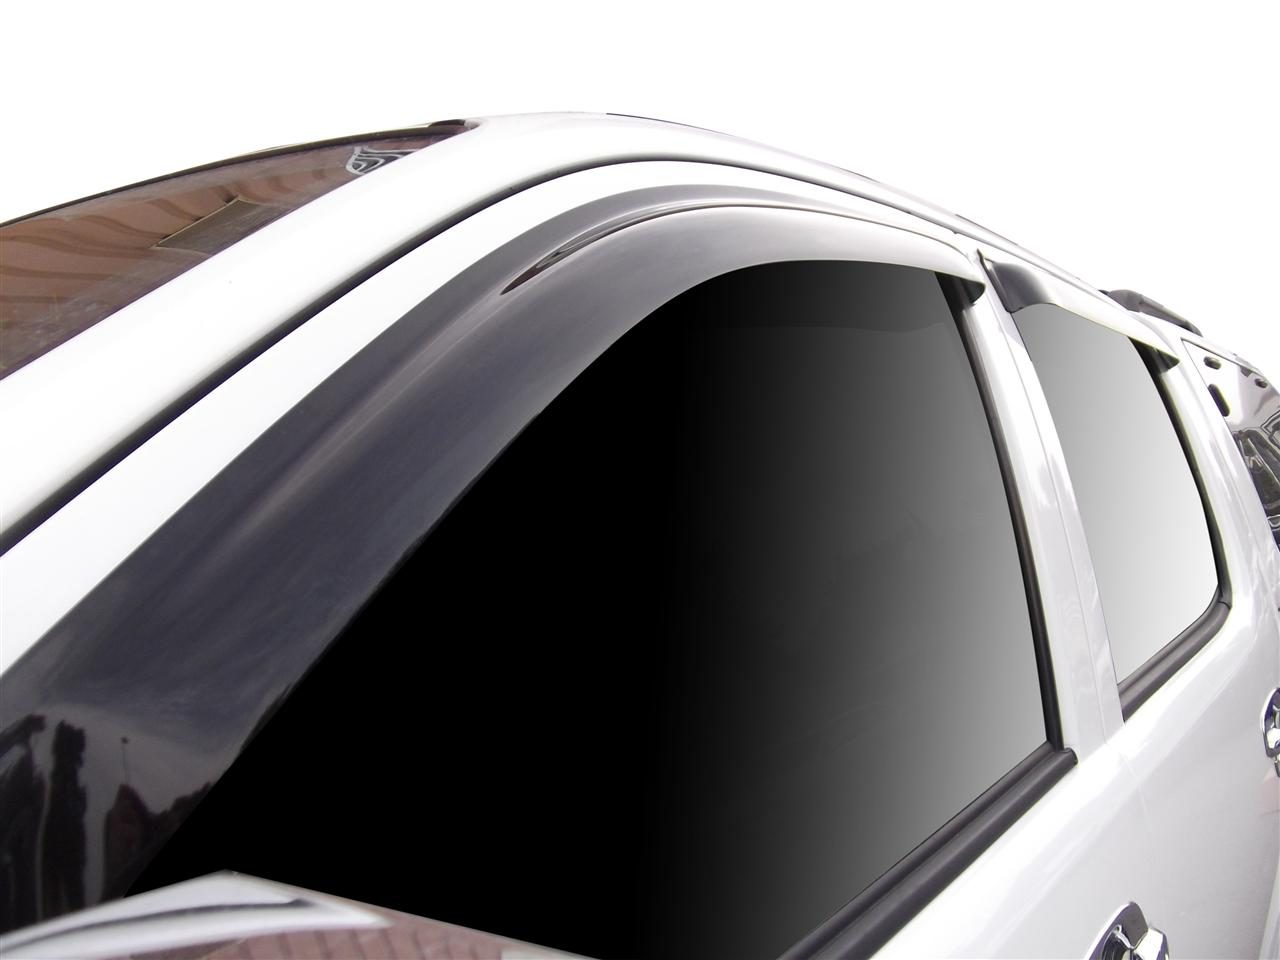 slw92496023b deflecteur d 39 air volkswagen amarok dble cab 2010 x4 volkswagen amarok. Black Bedroom Furniture Sets. Home Design Ideas